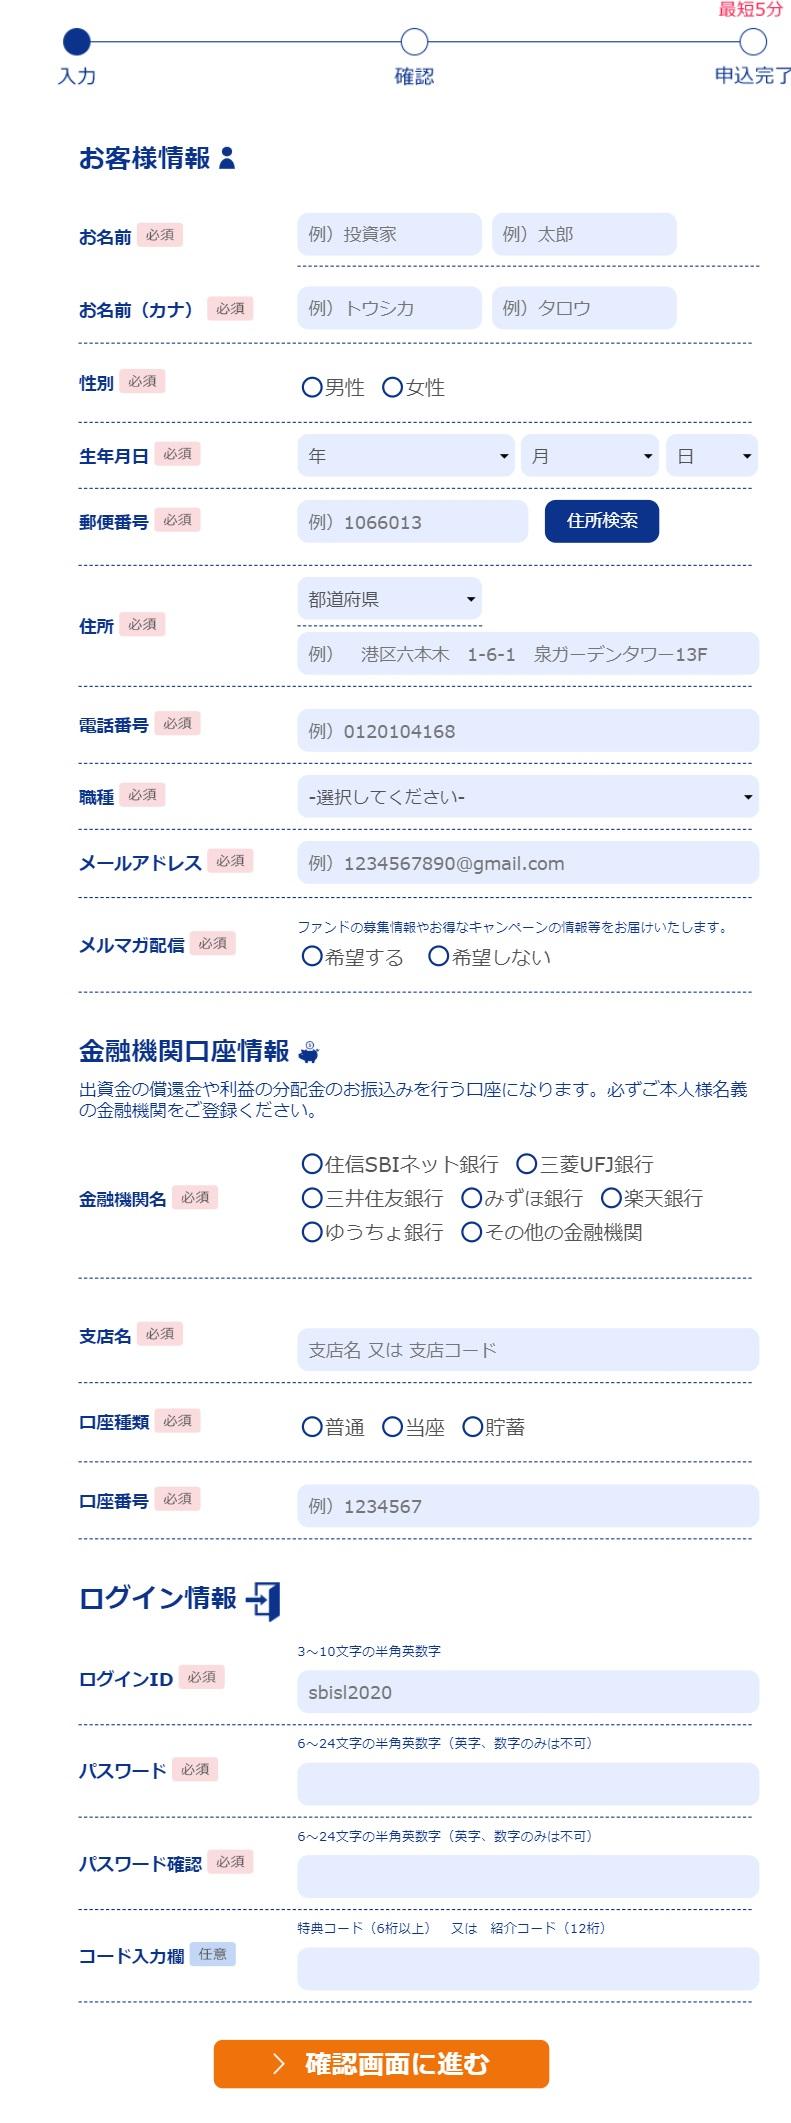 SBIソーシャルレンディング投資家登録Step4【氏名・住所等の登録】